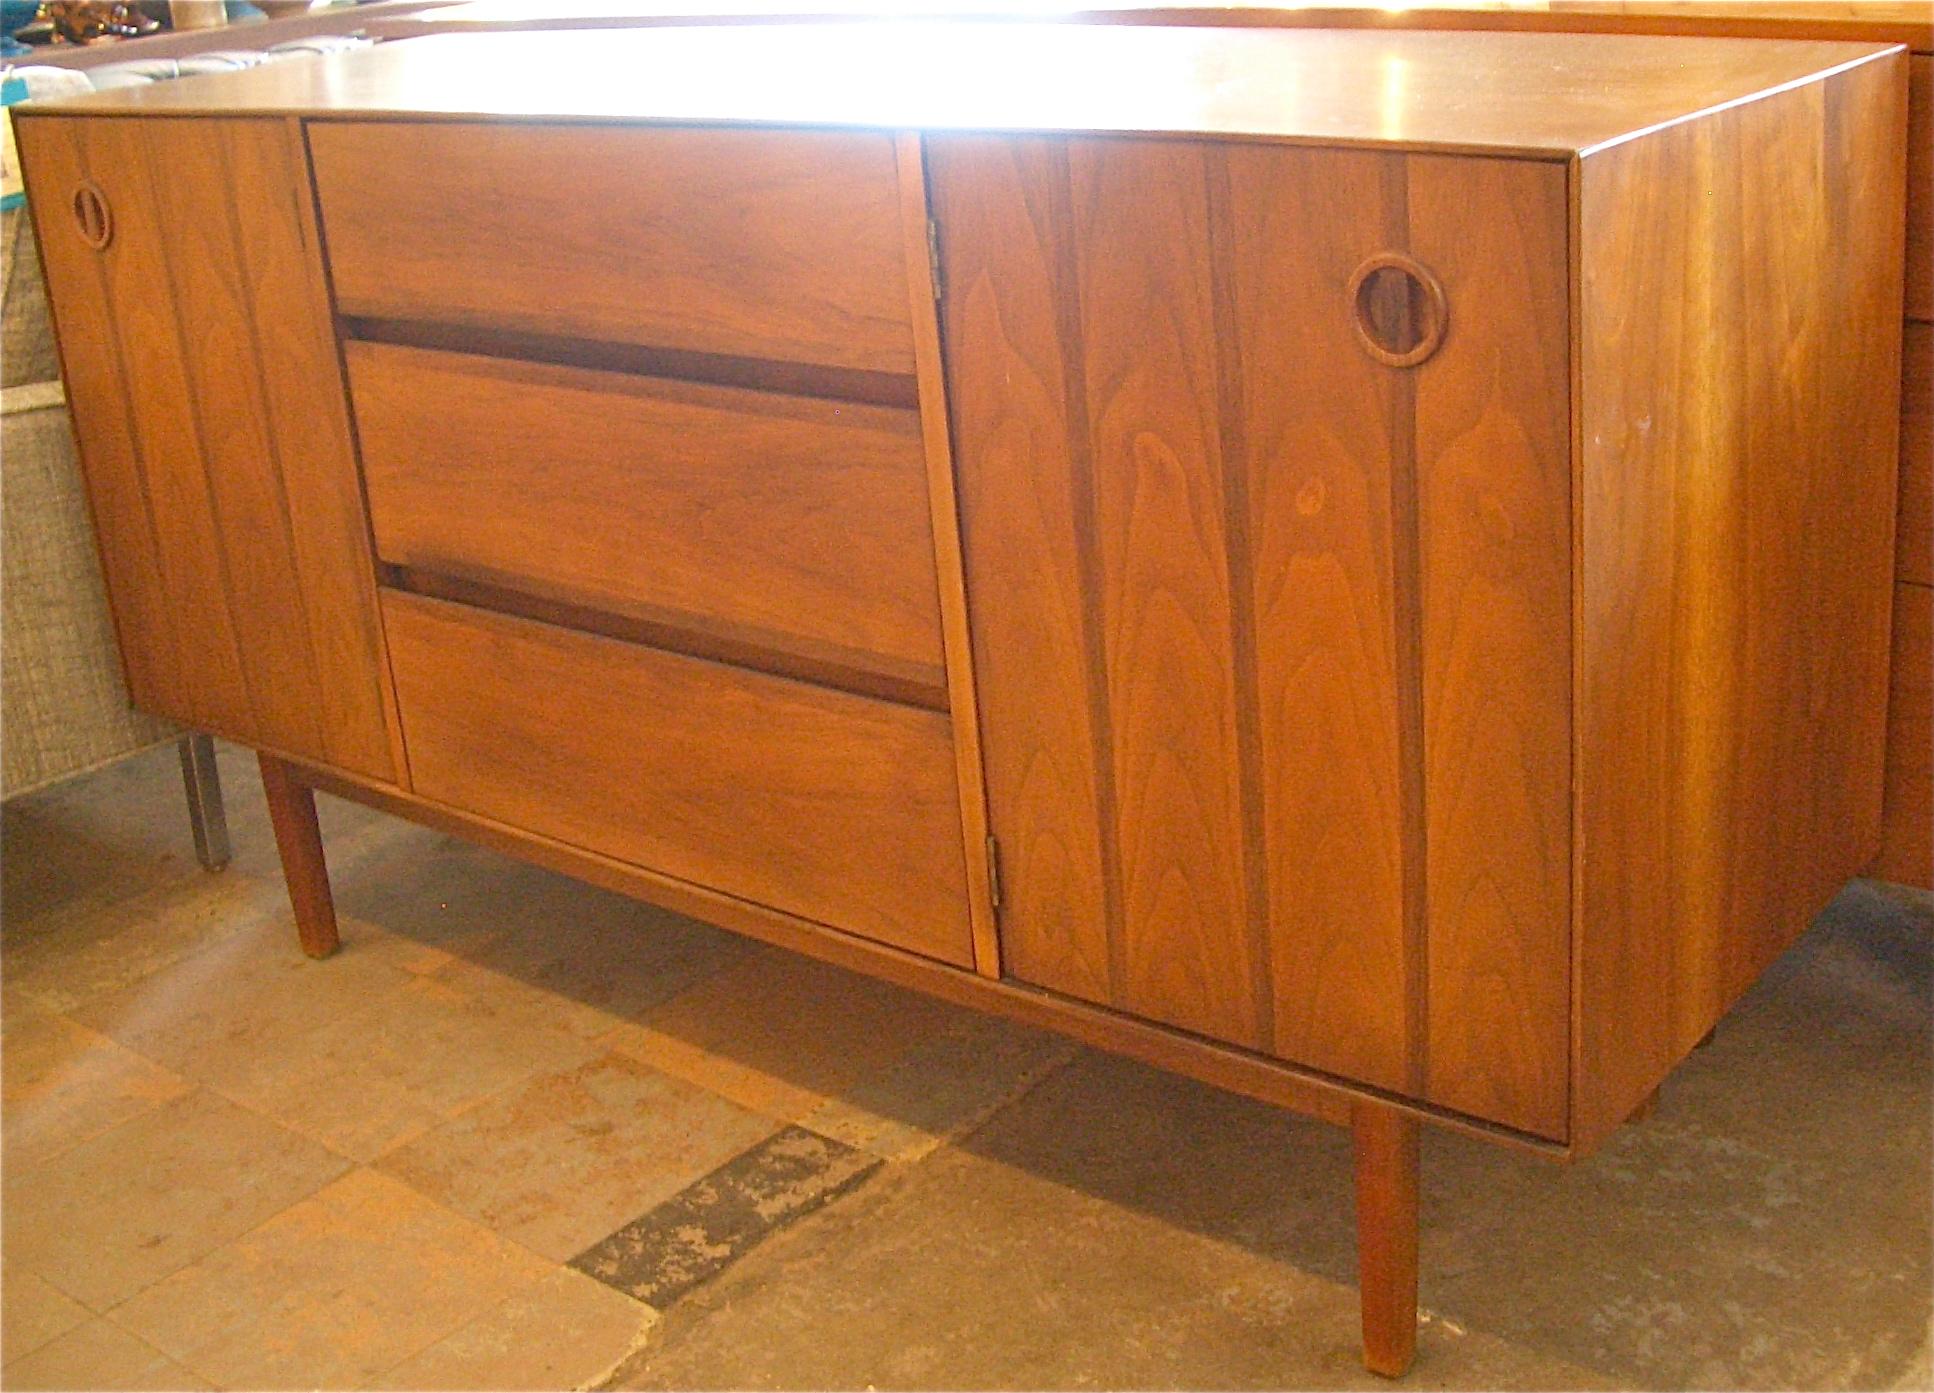 Walnut mcm buffet credenza mid century modern furniture for Mid century modern furniture houston